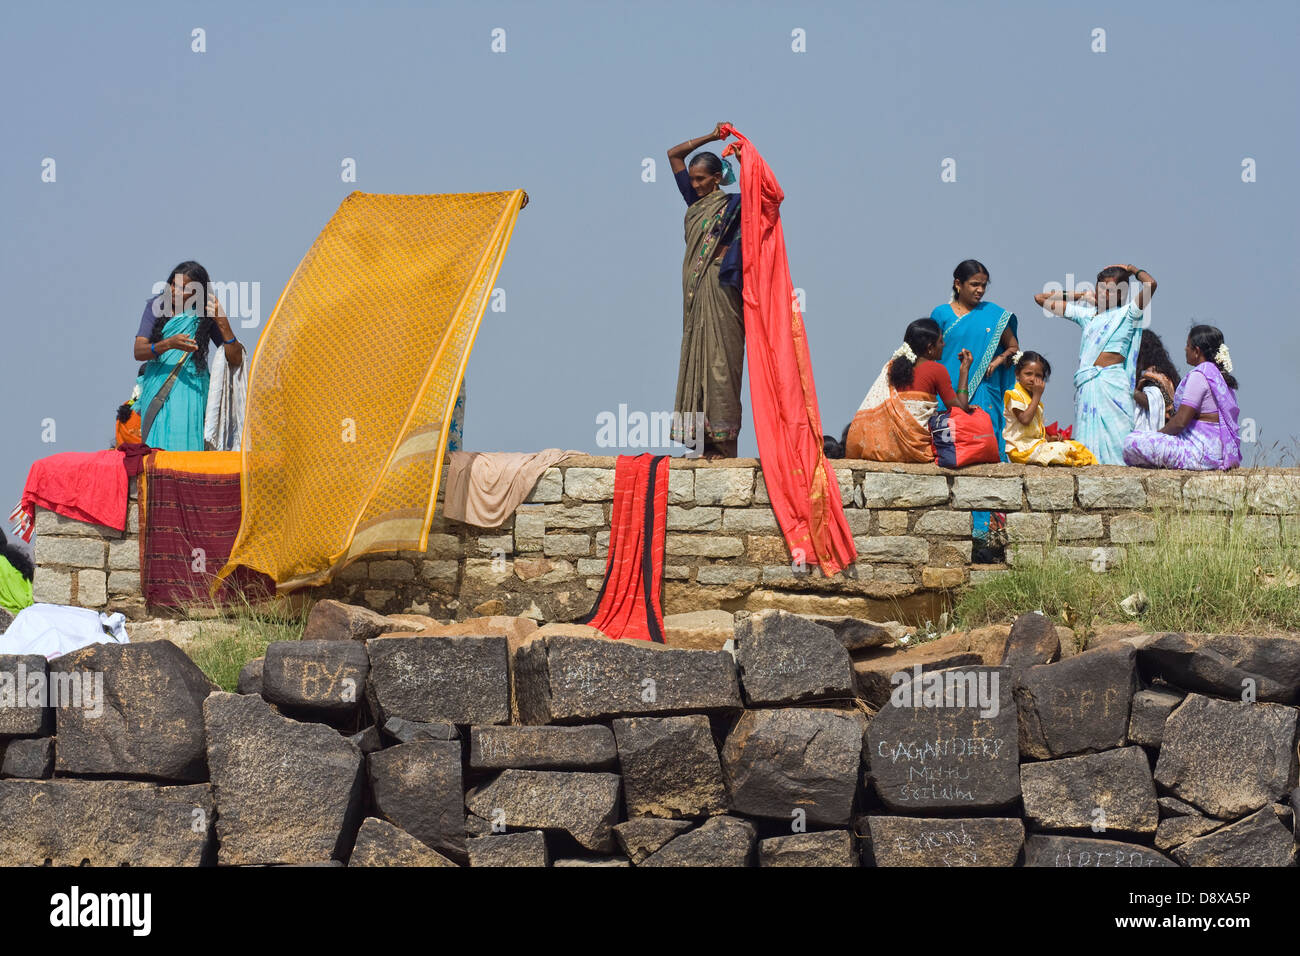 Tungabhadra river,Hampi,Karnataka,India,woman are drying their saris after a ritual bath - Stock Image